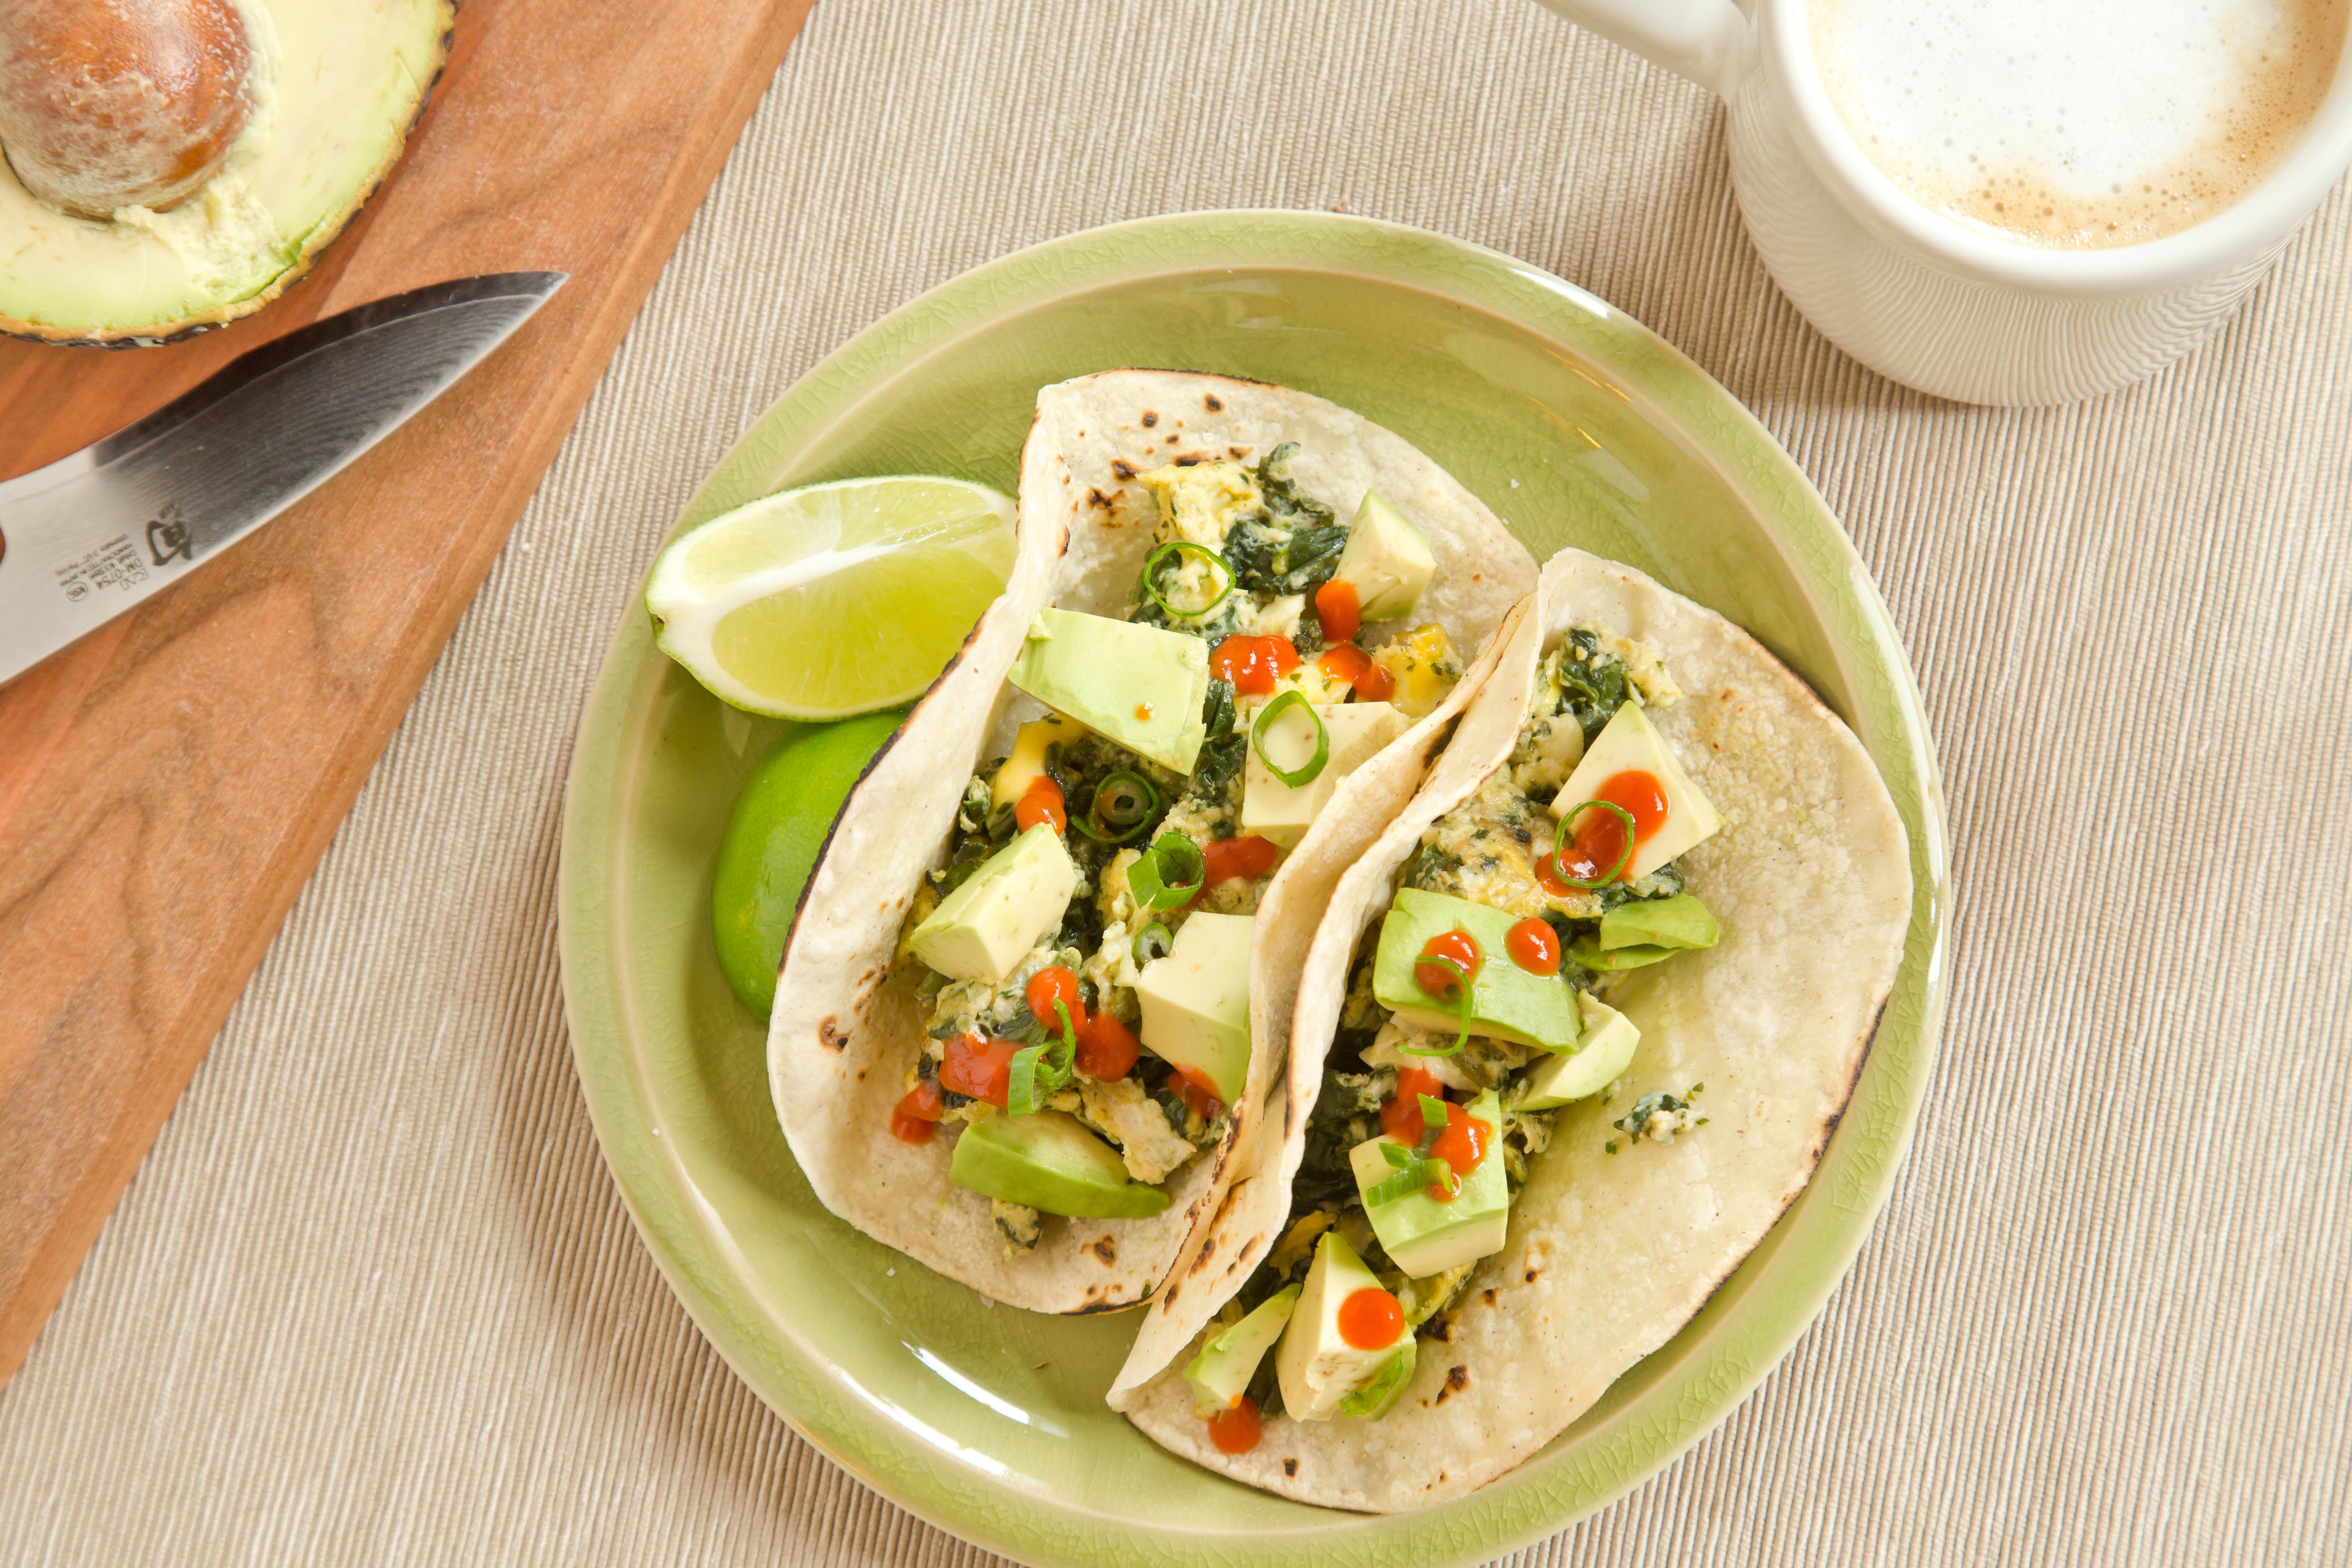 Healthy Breakfast Tacos  Avocado Spinach and Egg Breakfast Tacos TODAY